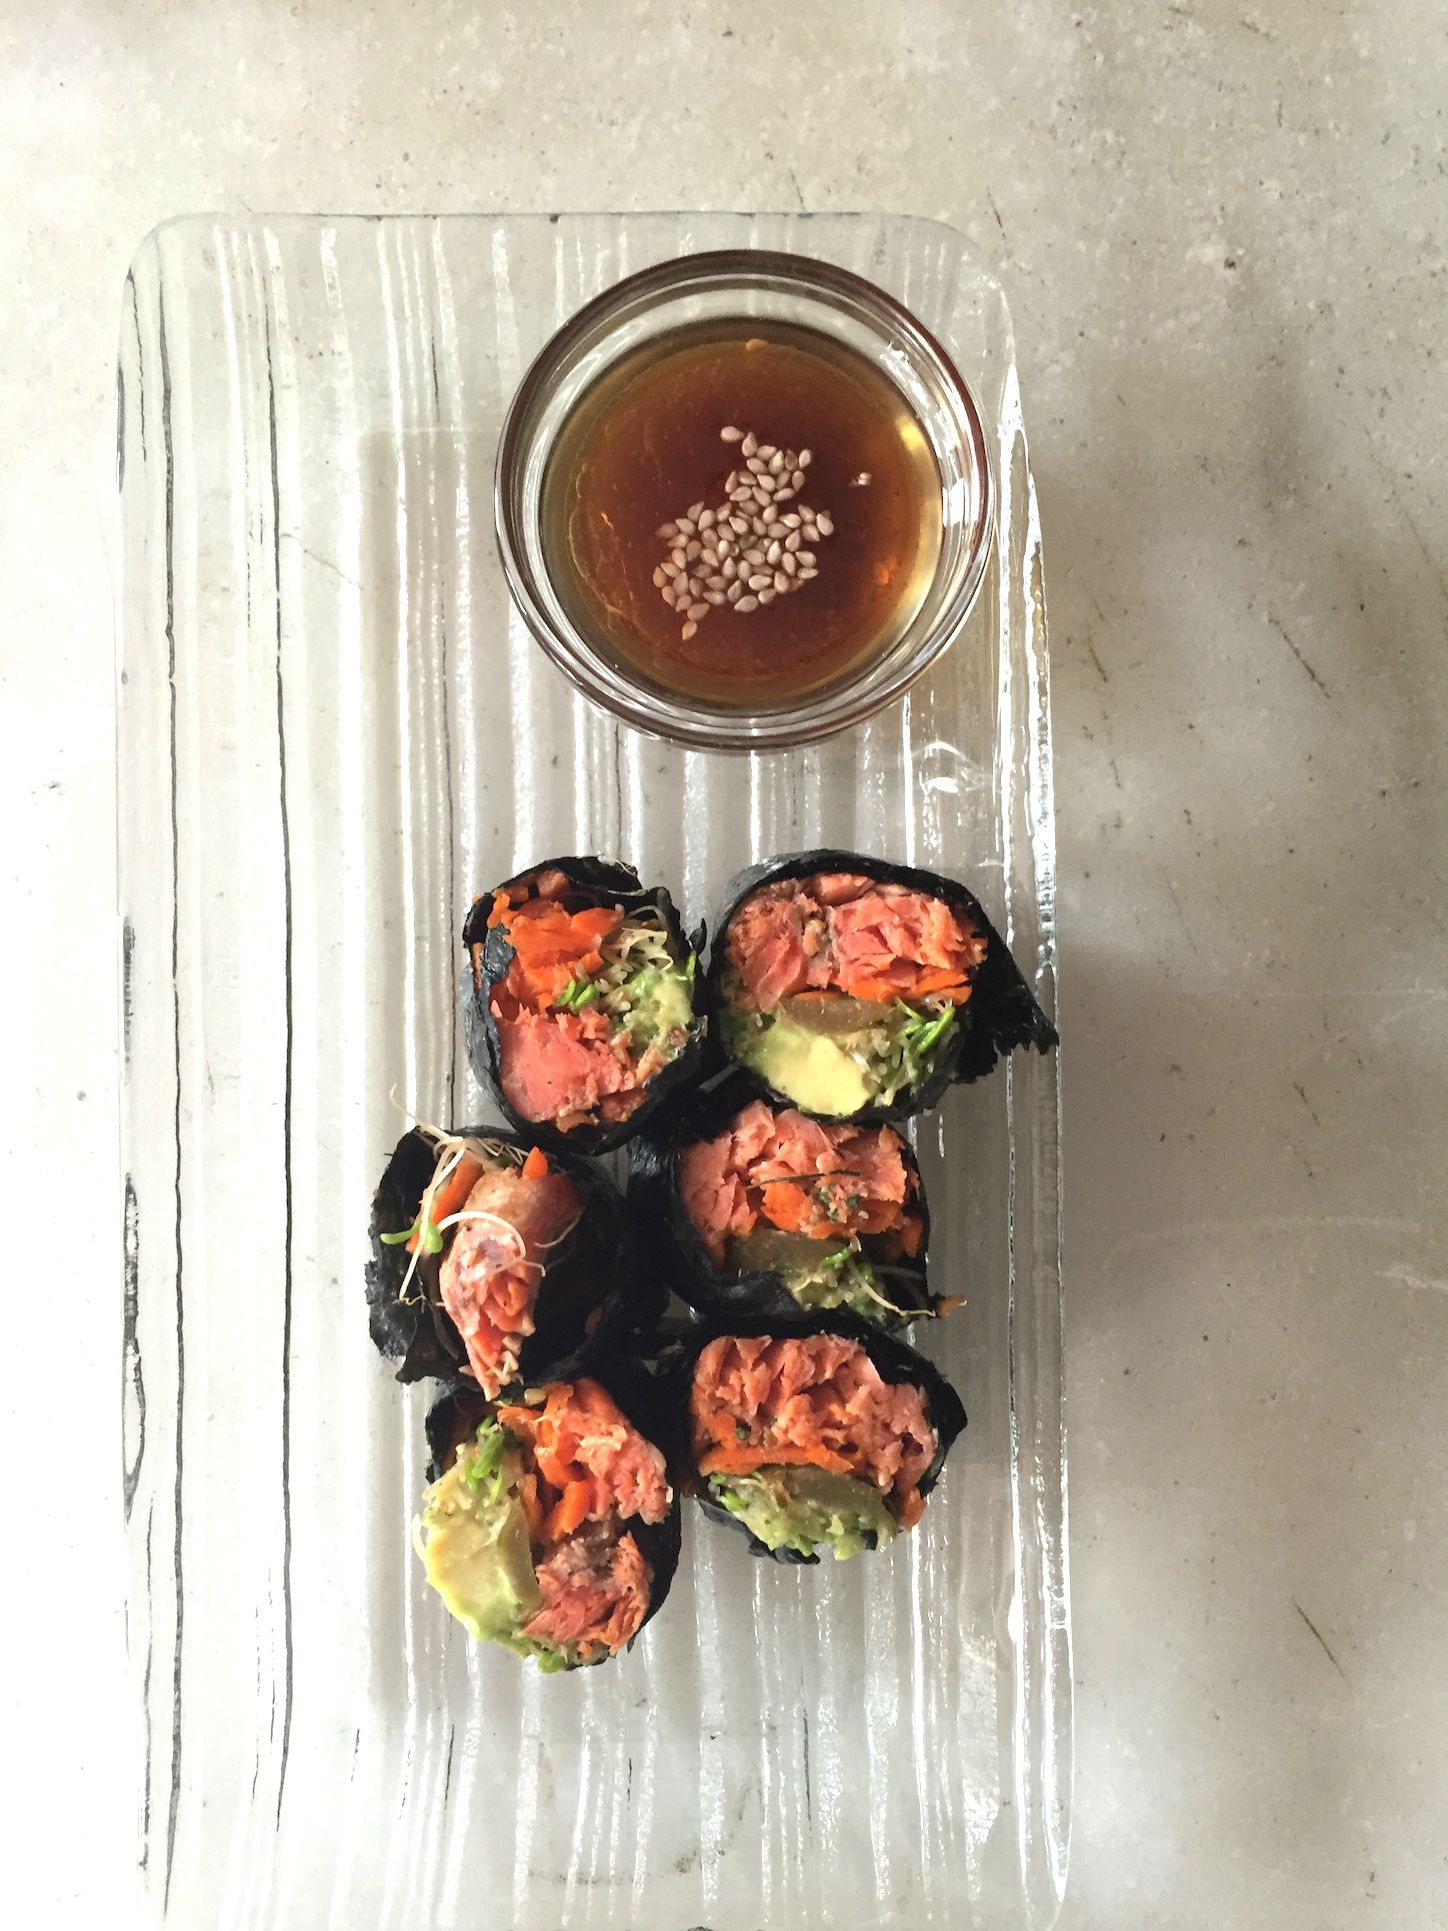 Nori Rolls with Smoked Salmon